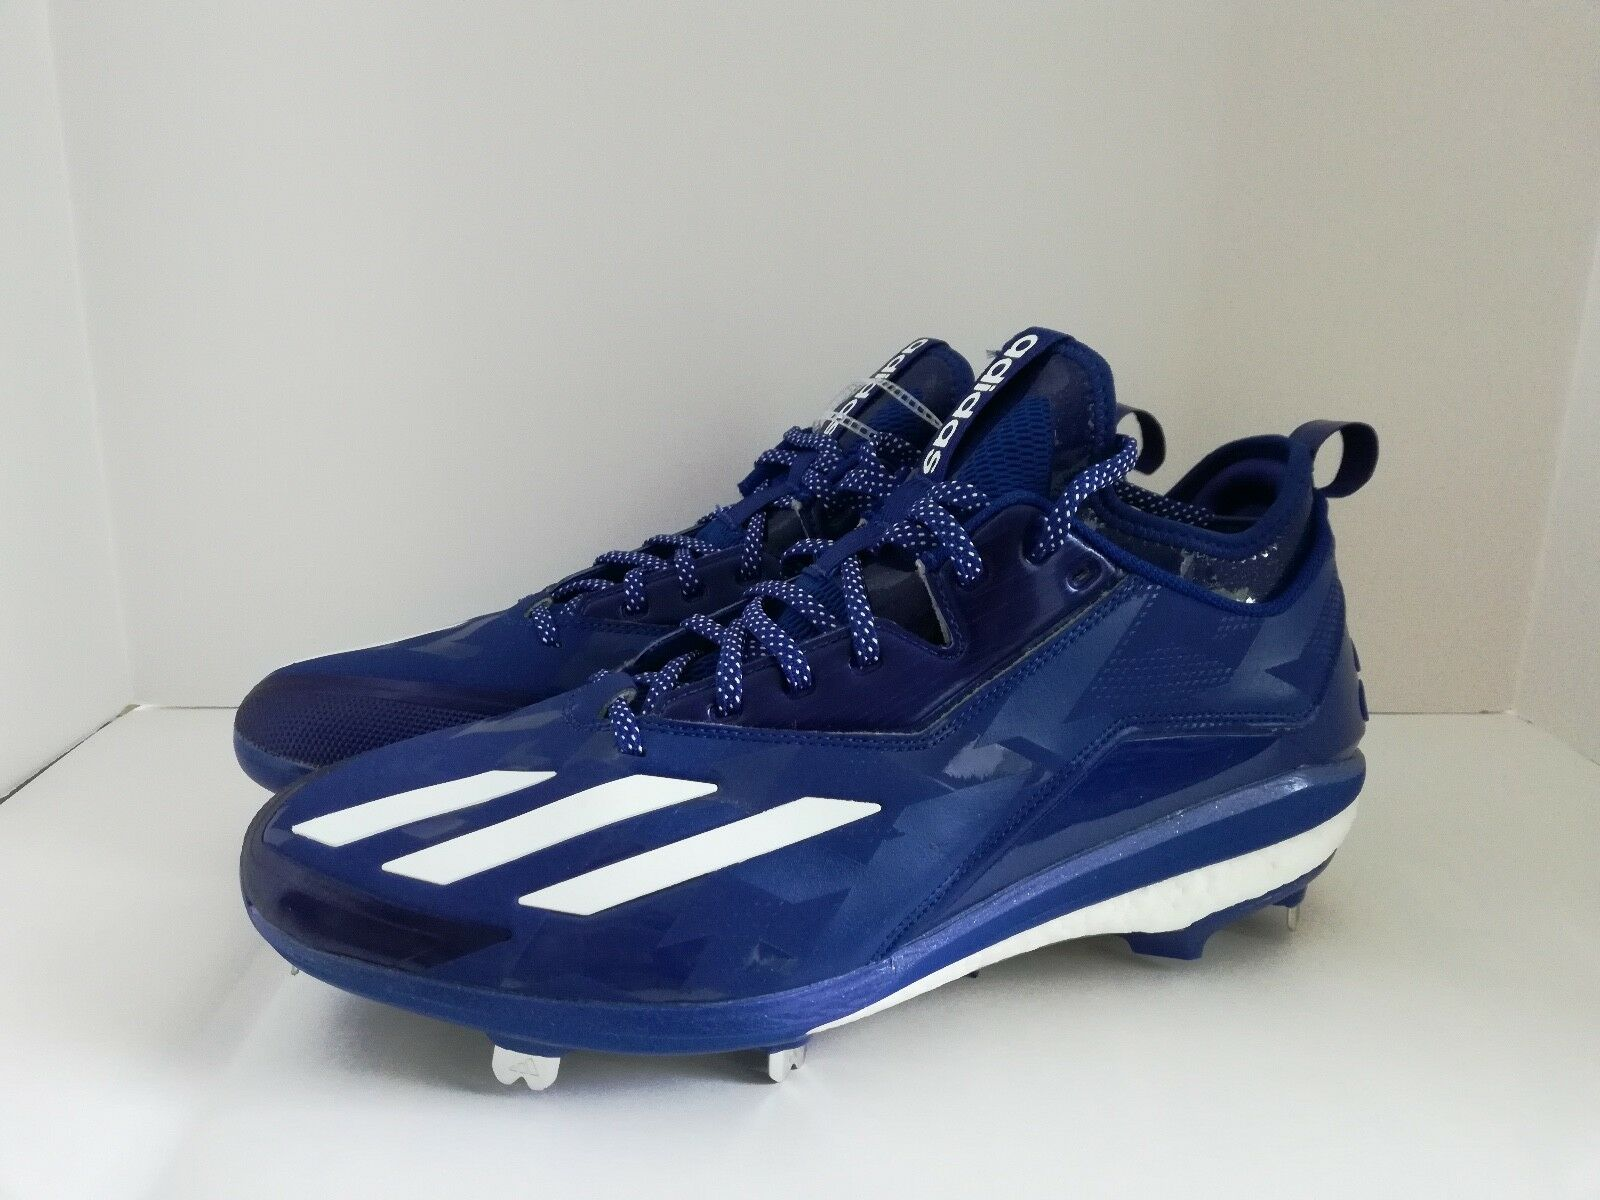 Adidas Energy Boost Blue/White Icon Metal Baseball Cleats Blue/White Boost B72825 Mens Size 12.5 77b445